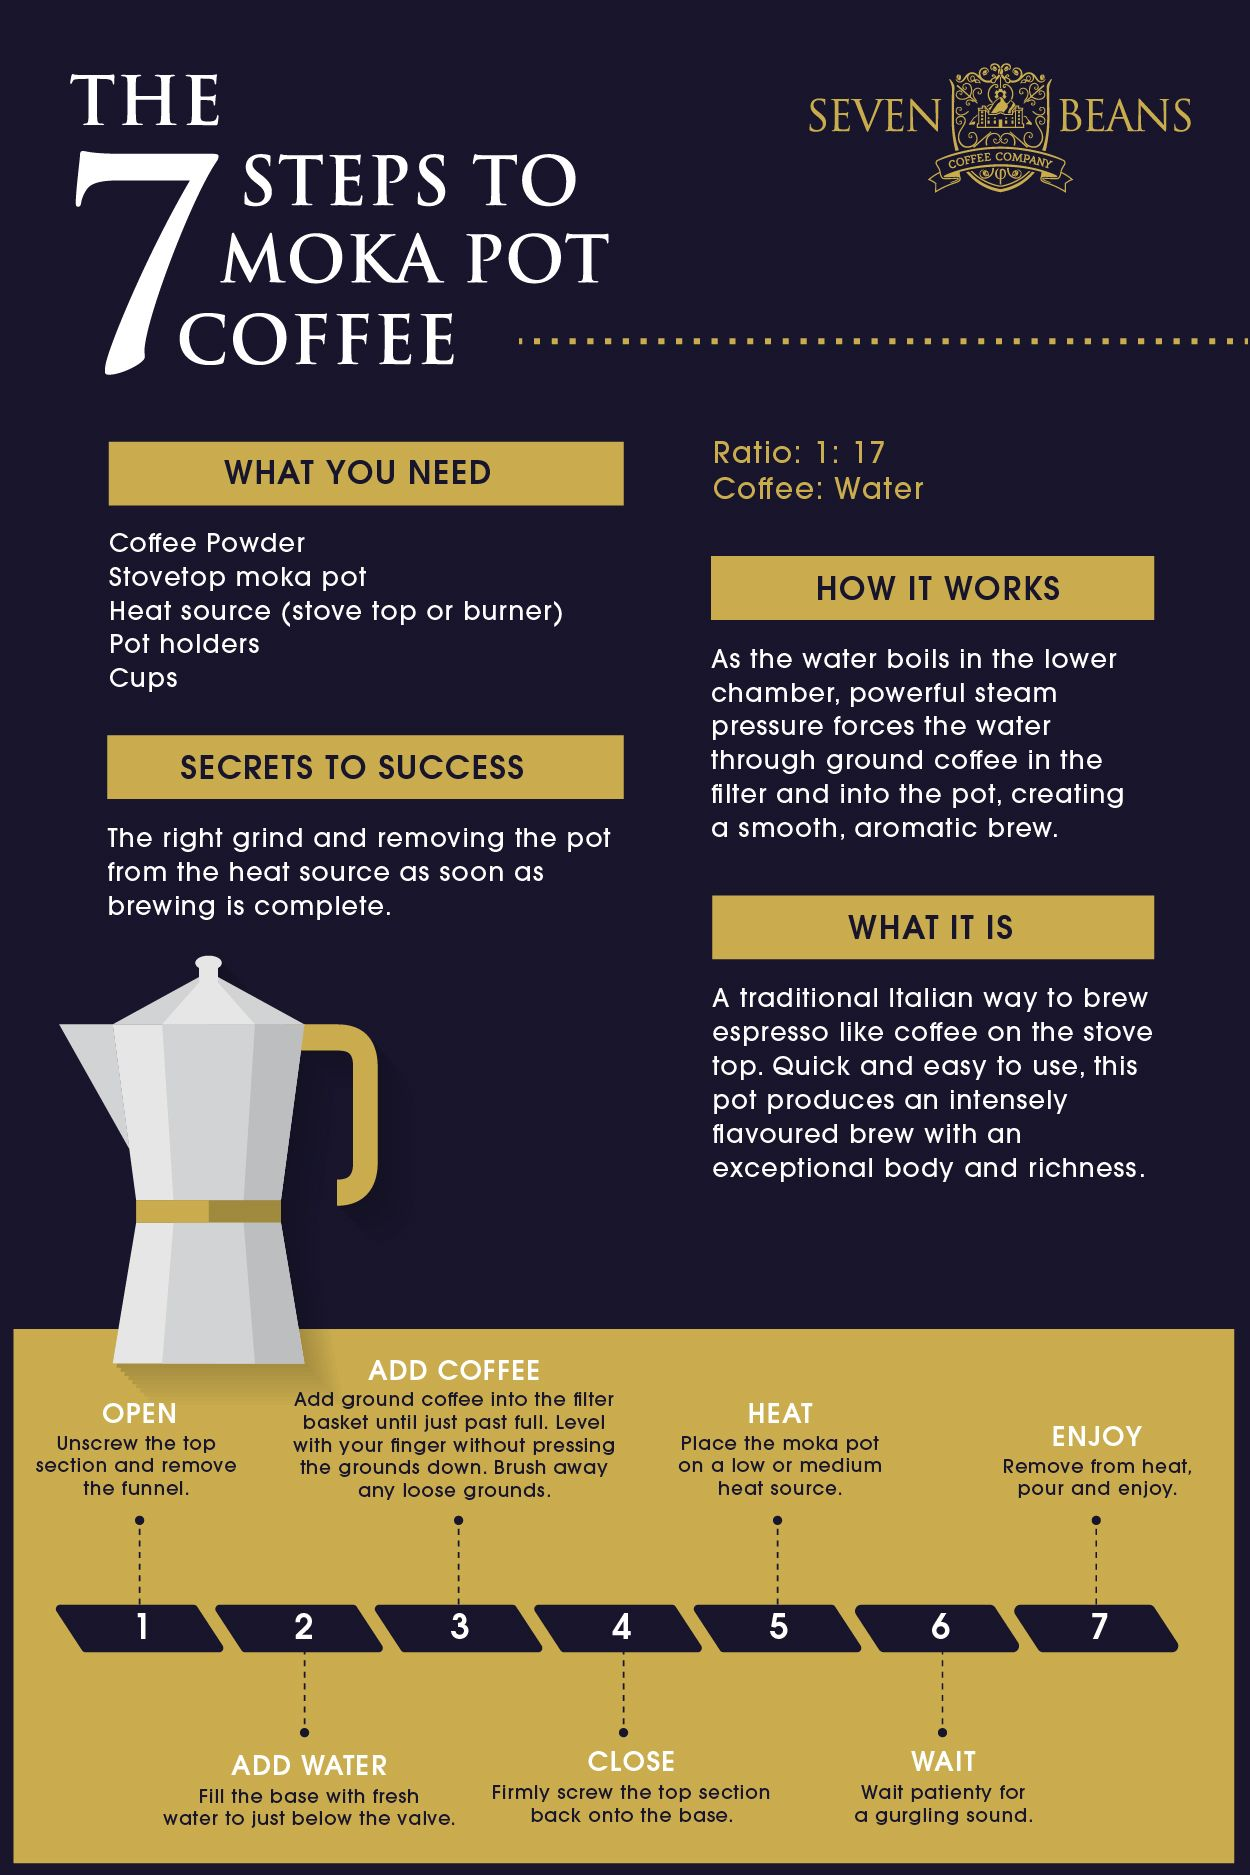 A step by step guide on moka pot coffee preparation. A how